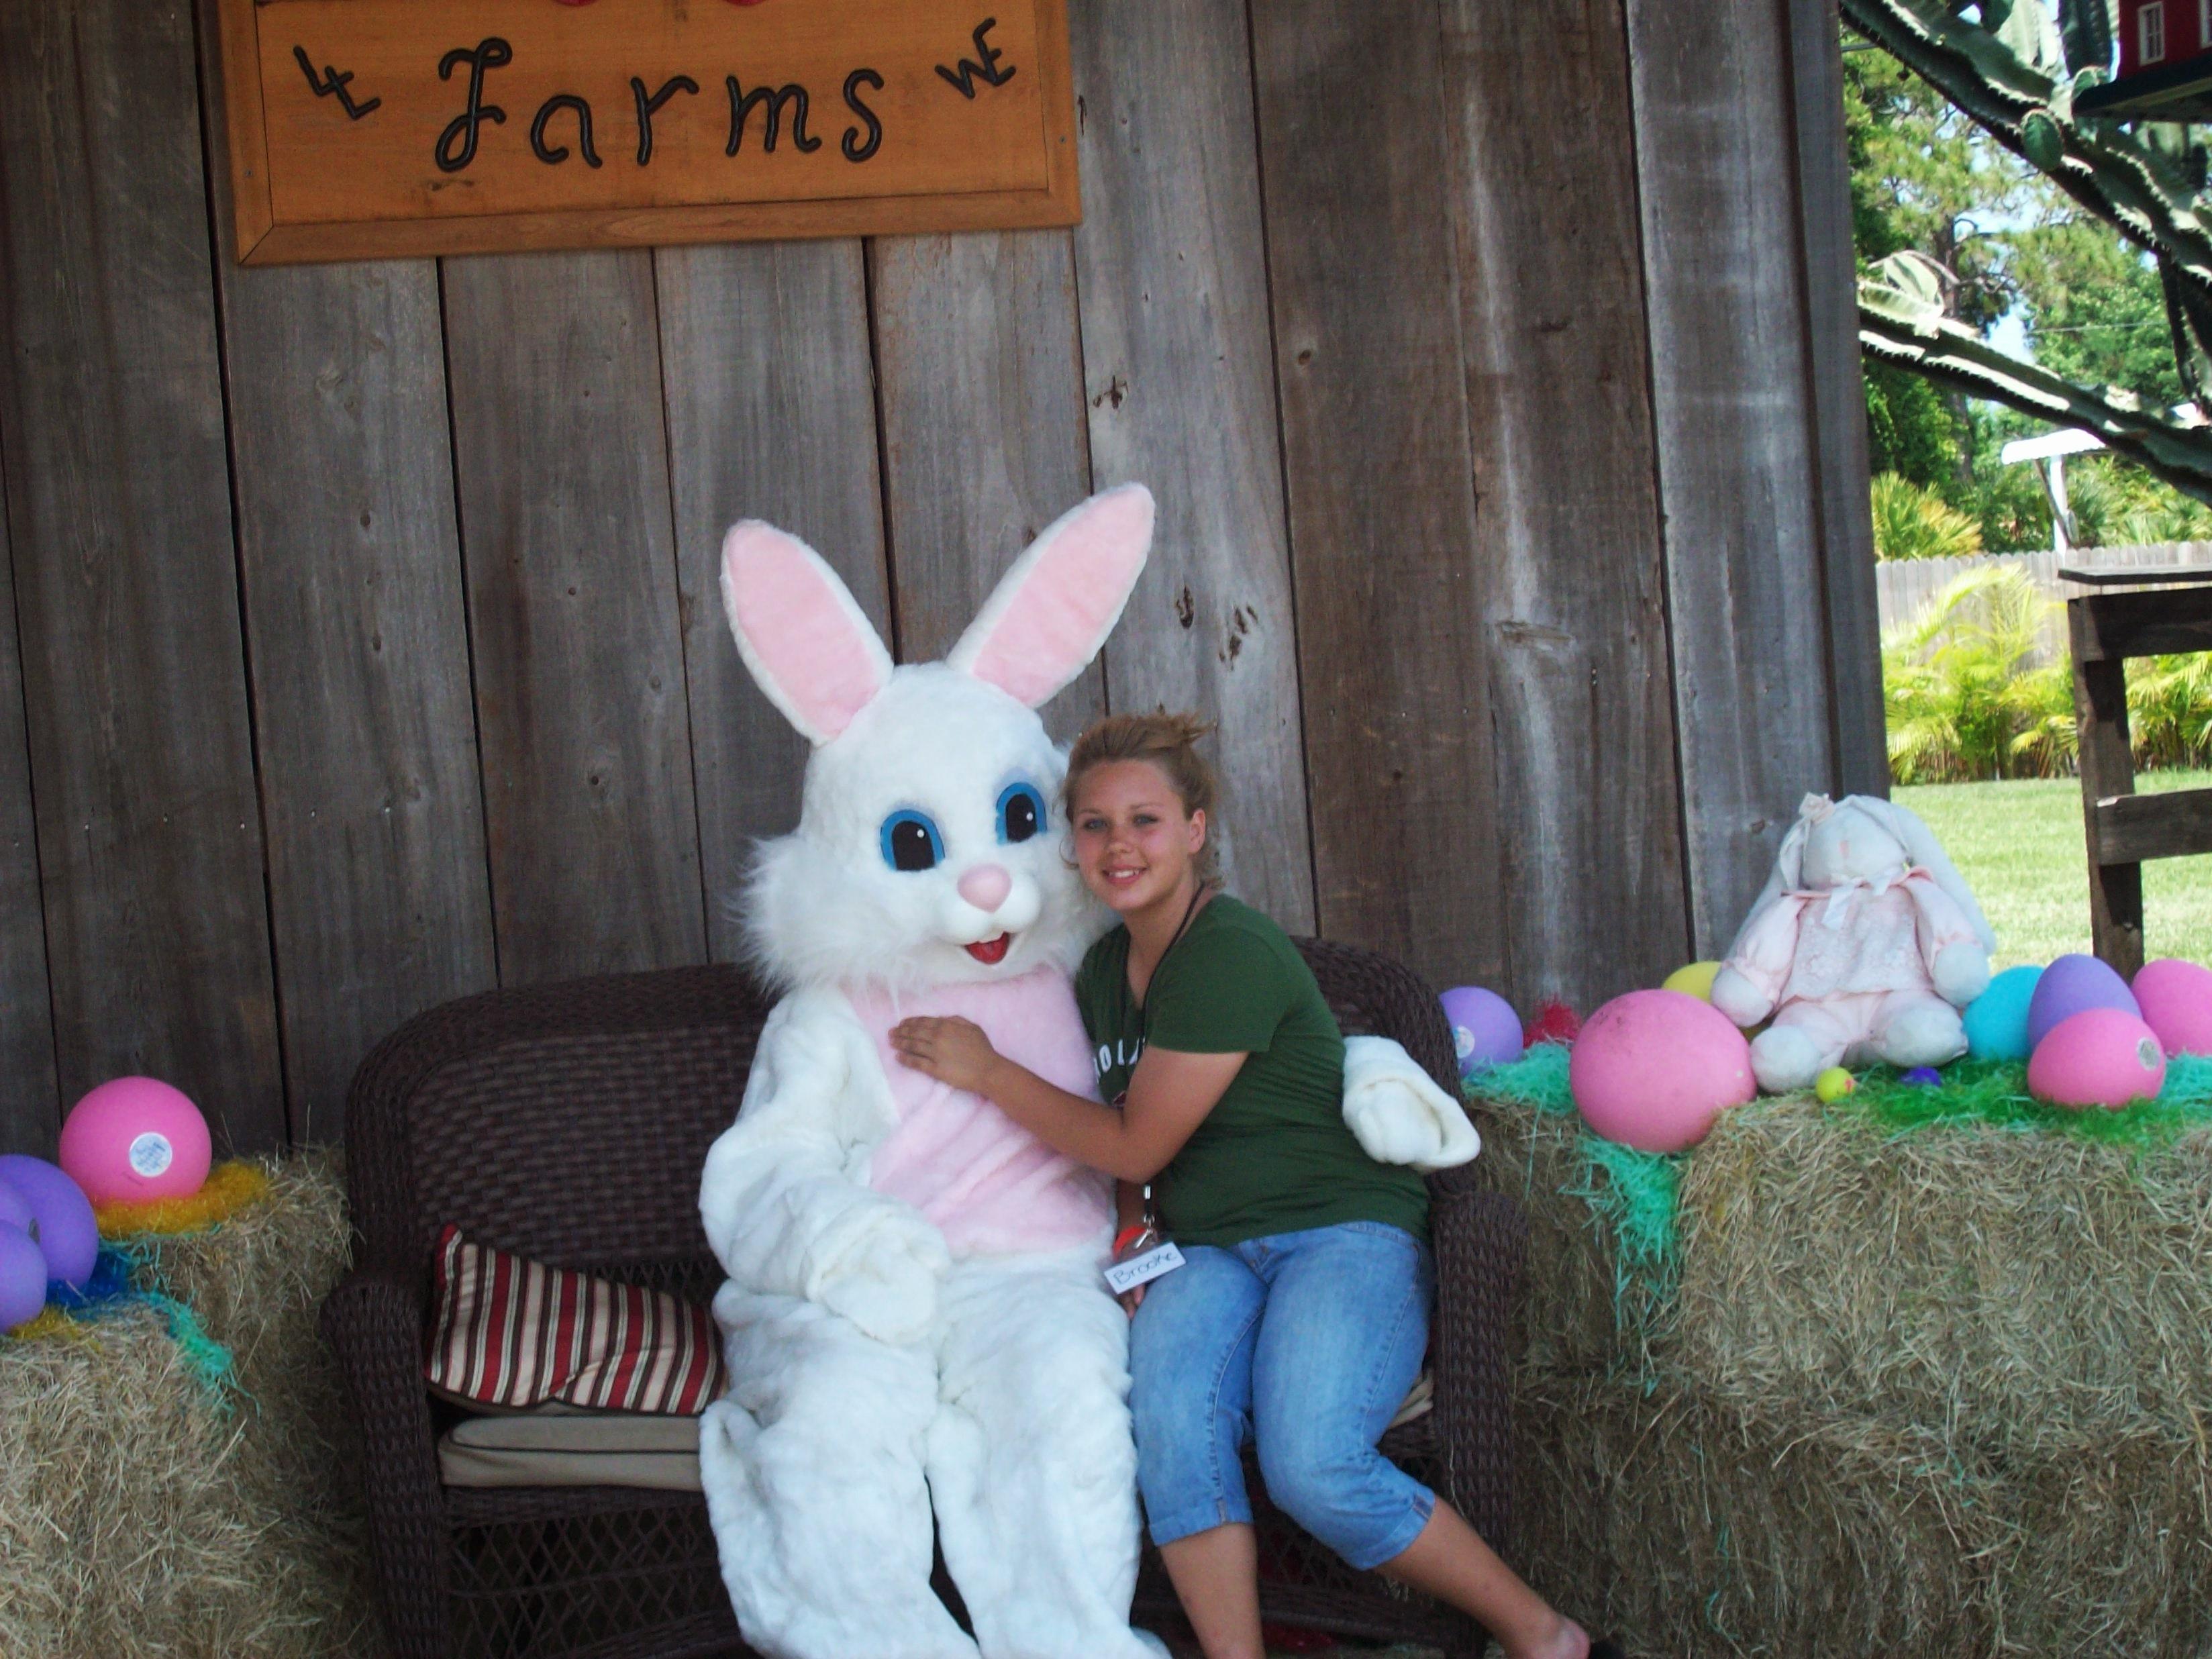 LaPorte Farms